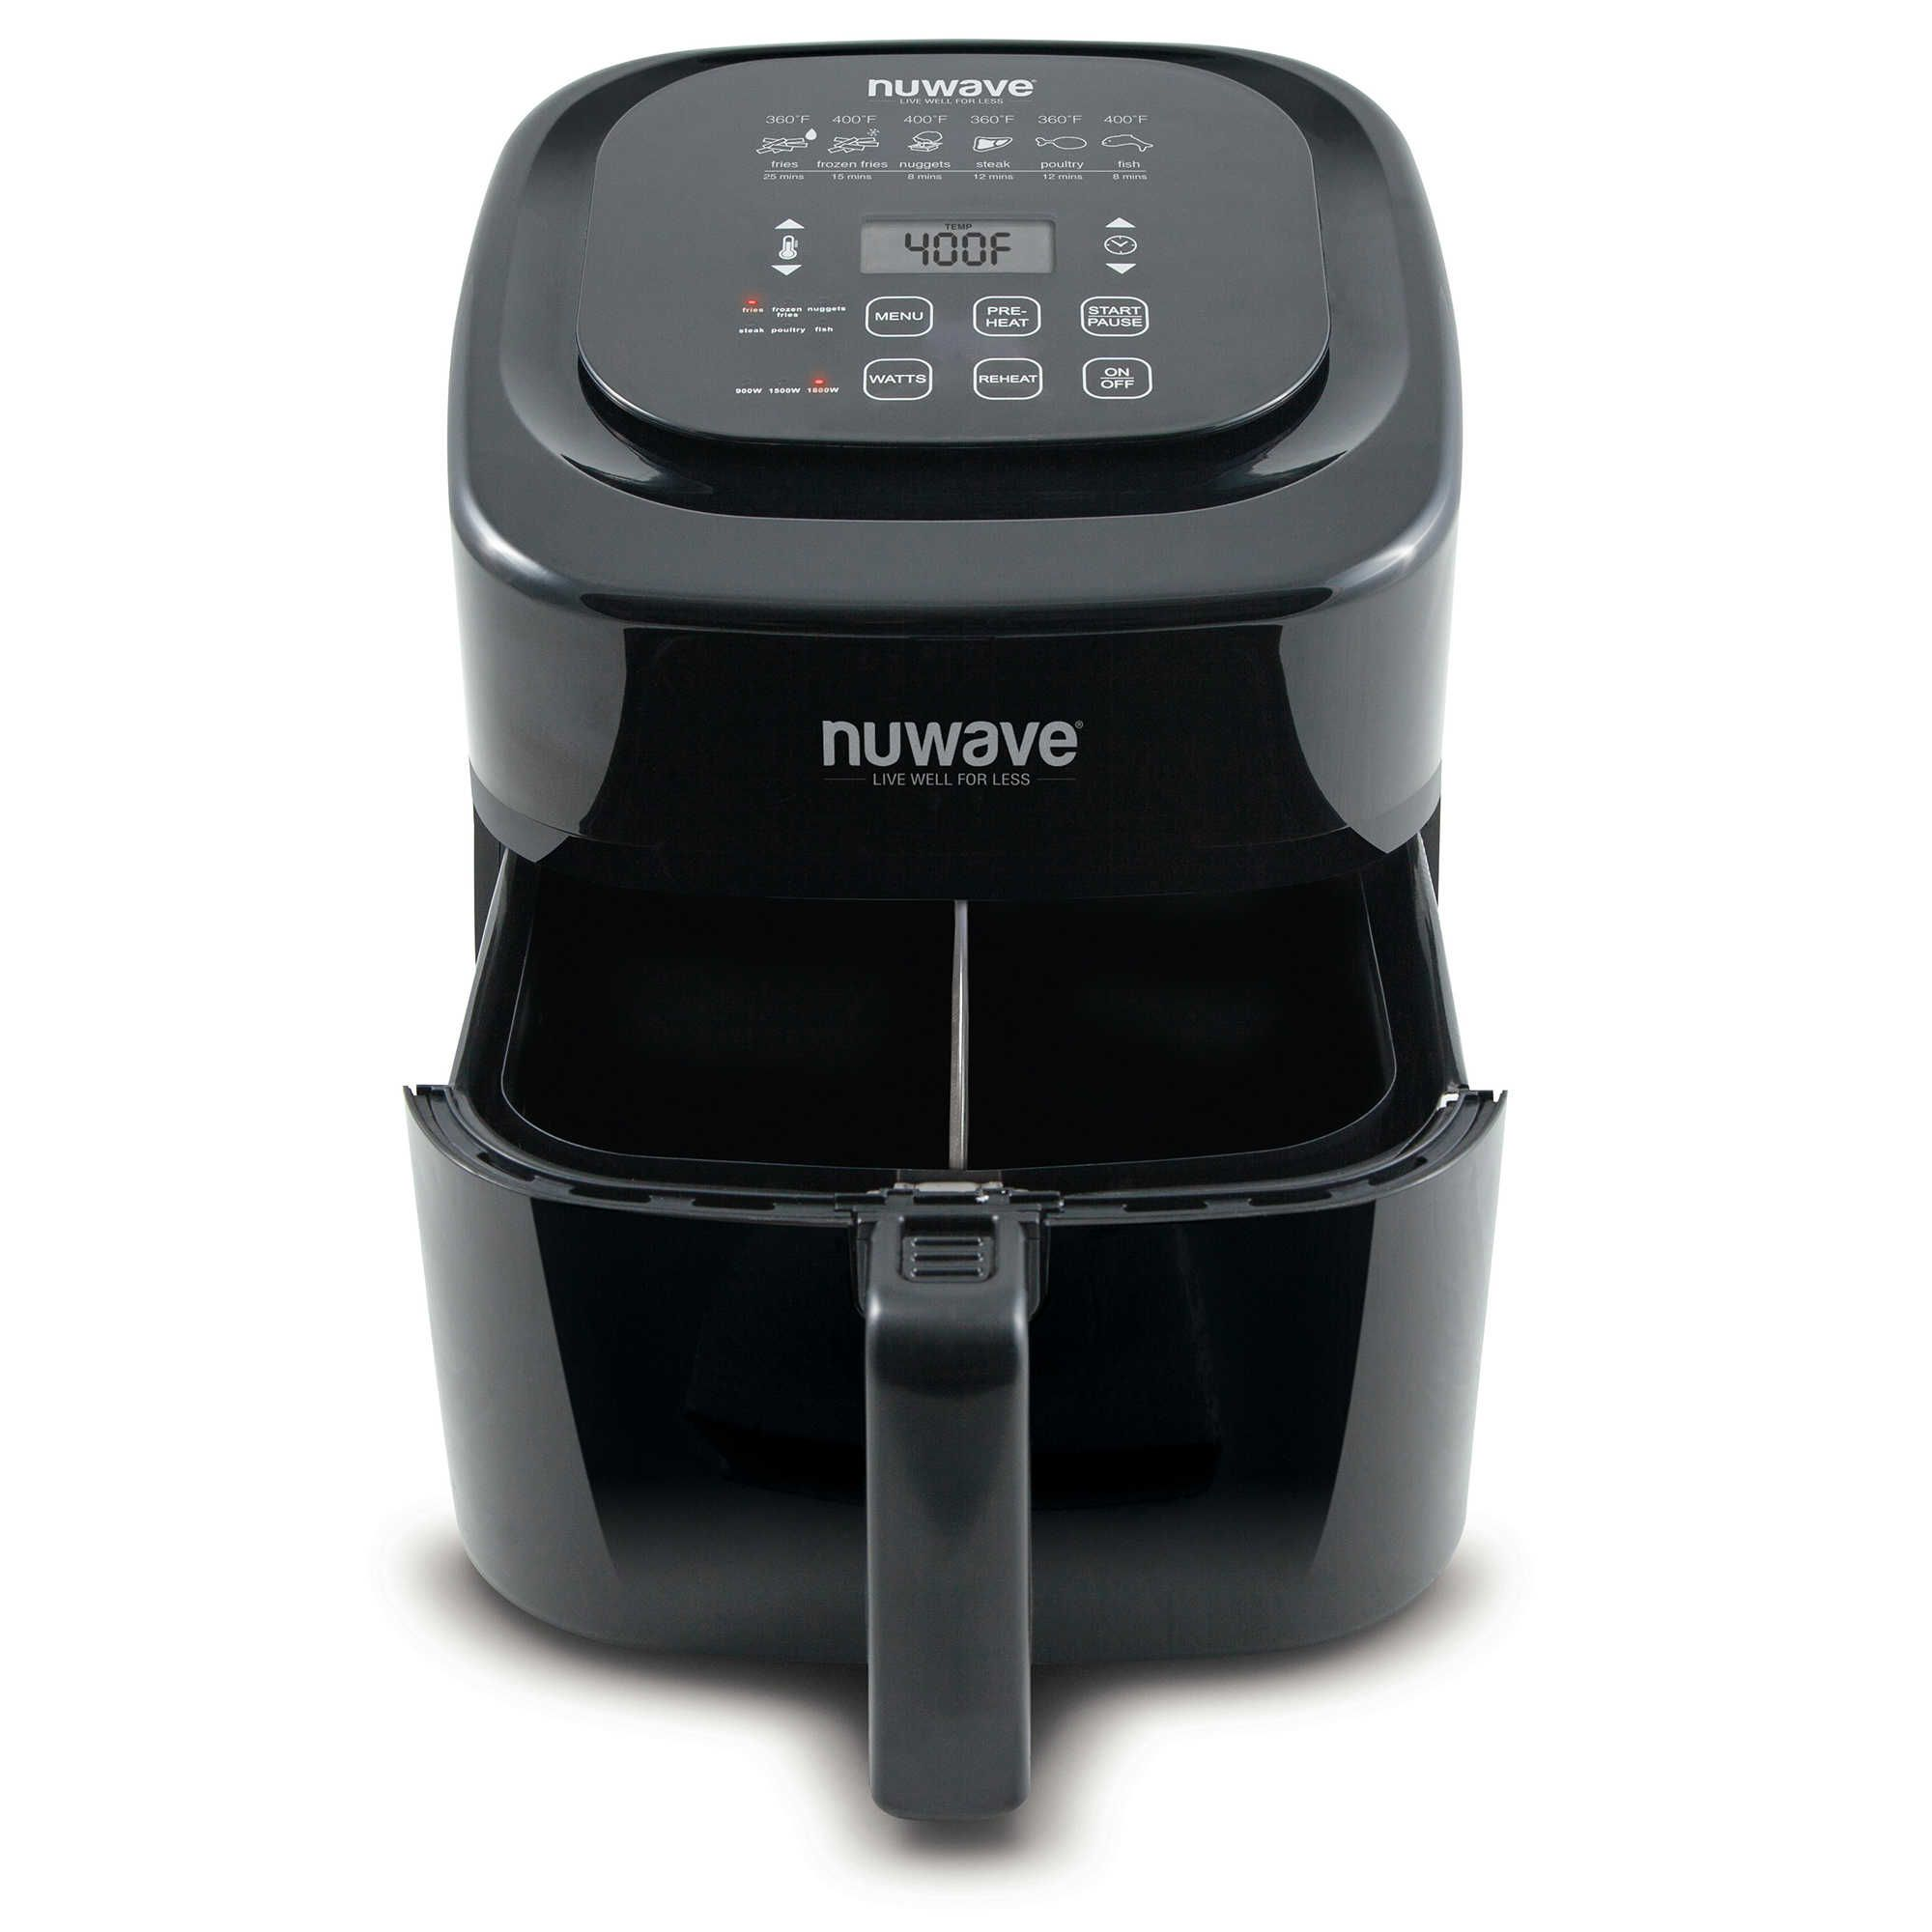 NuWave® 6 qt. Airfryer in Black Nuwave, Fryer